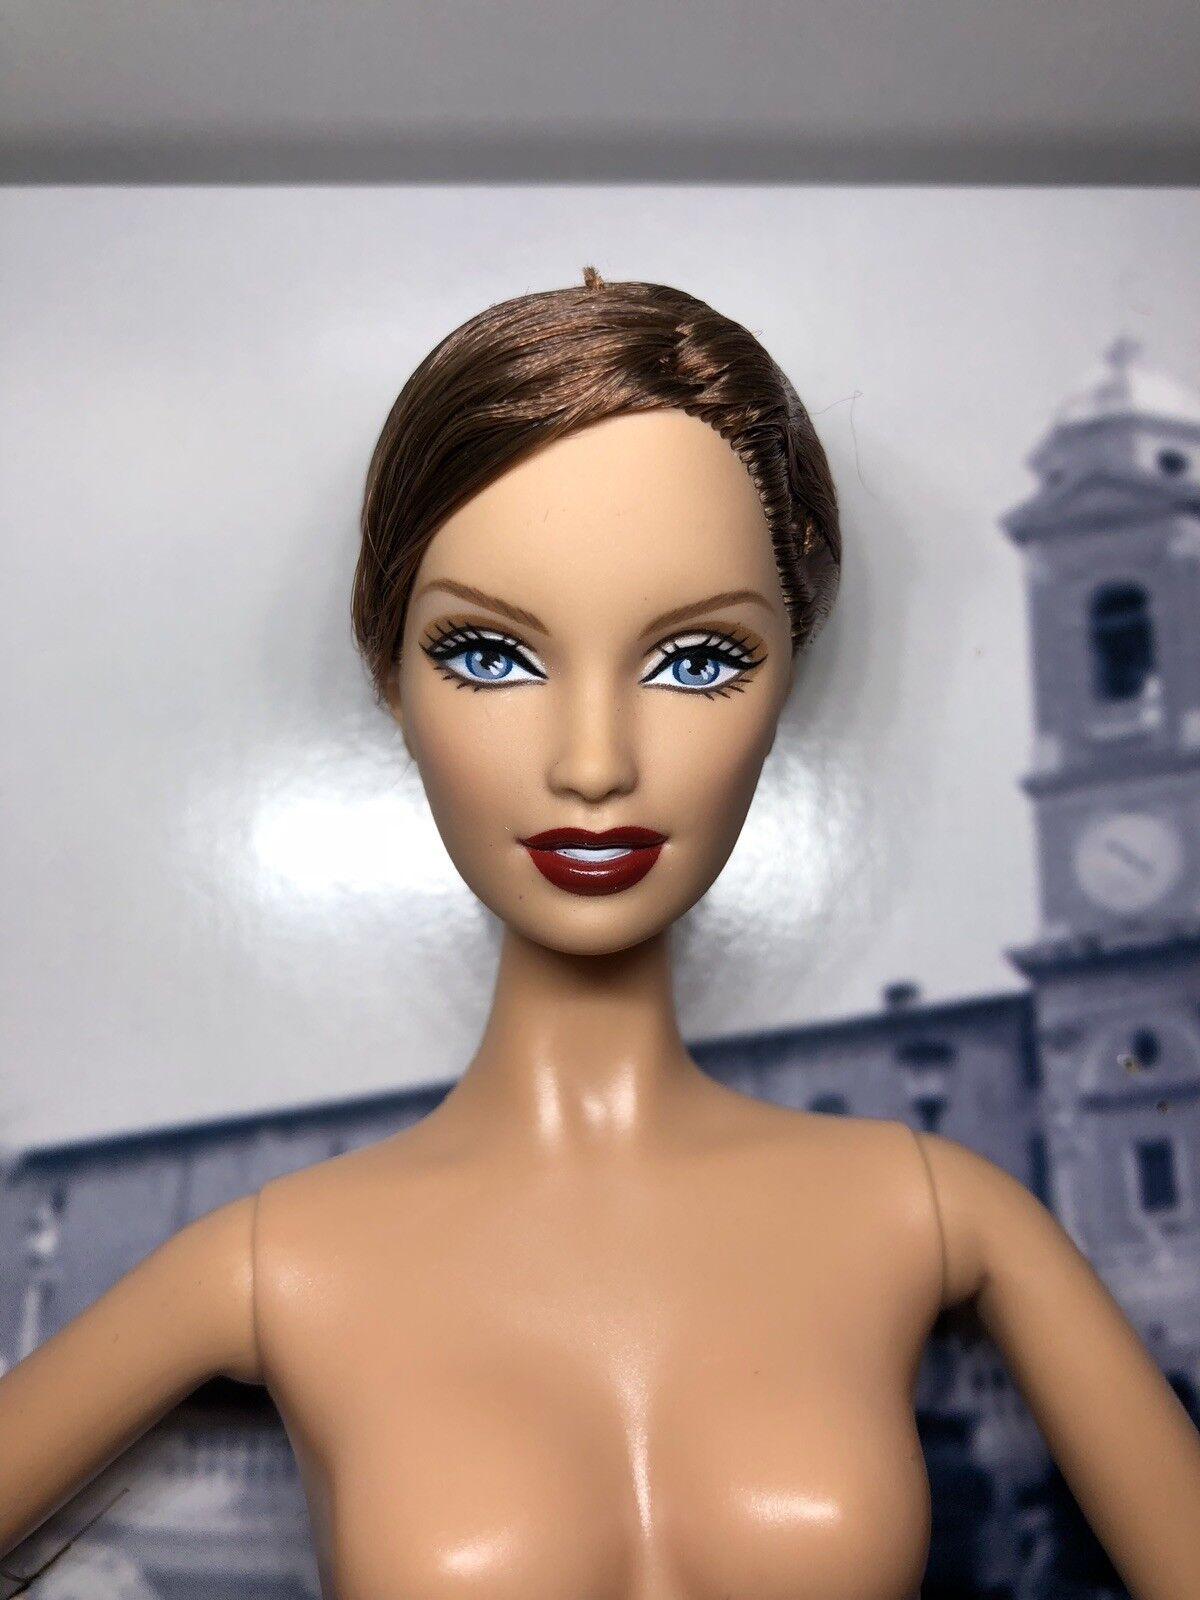 2005 Colector De Mattel Muñeca Barbie desnuda oro Label Ferrari, soporte, certificado de autenticidad H6466